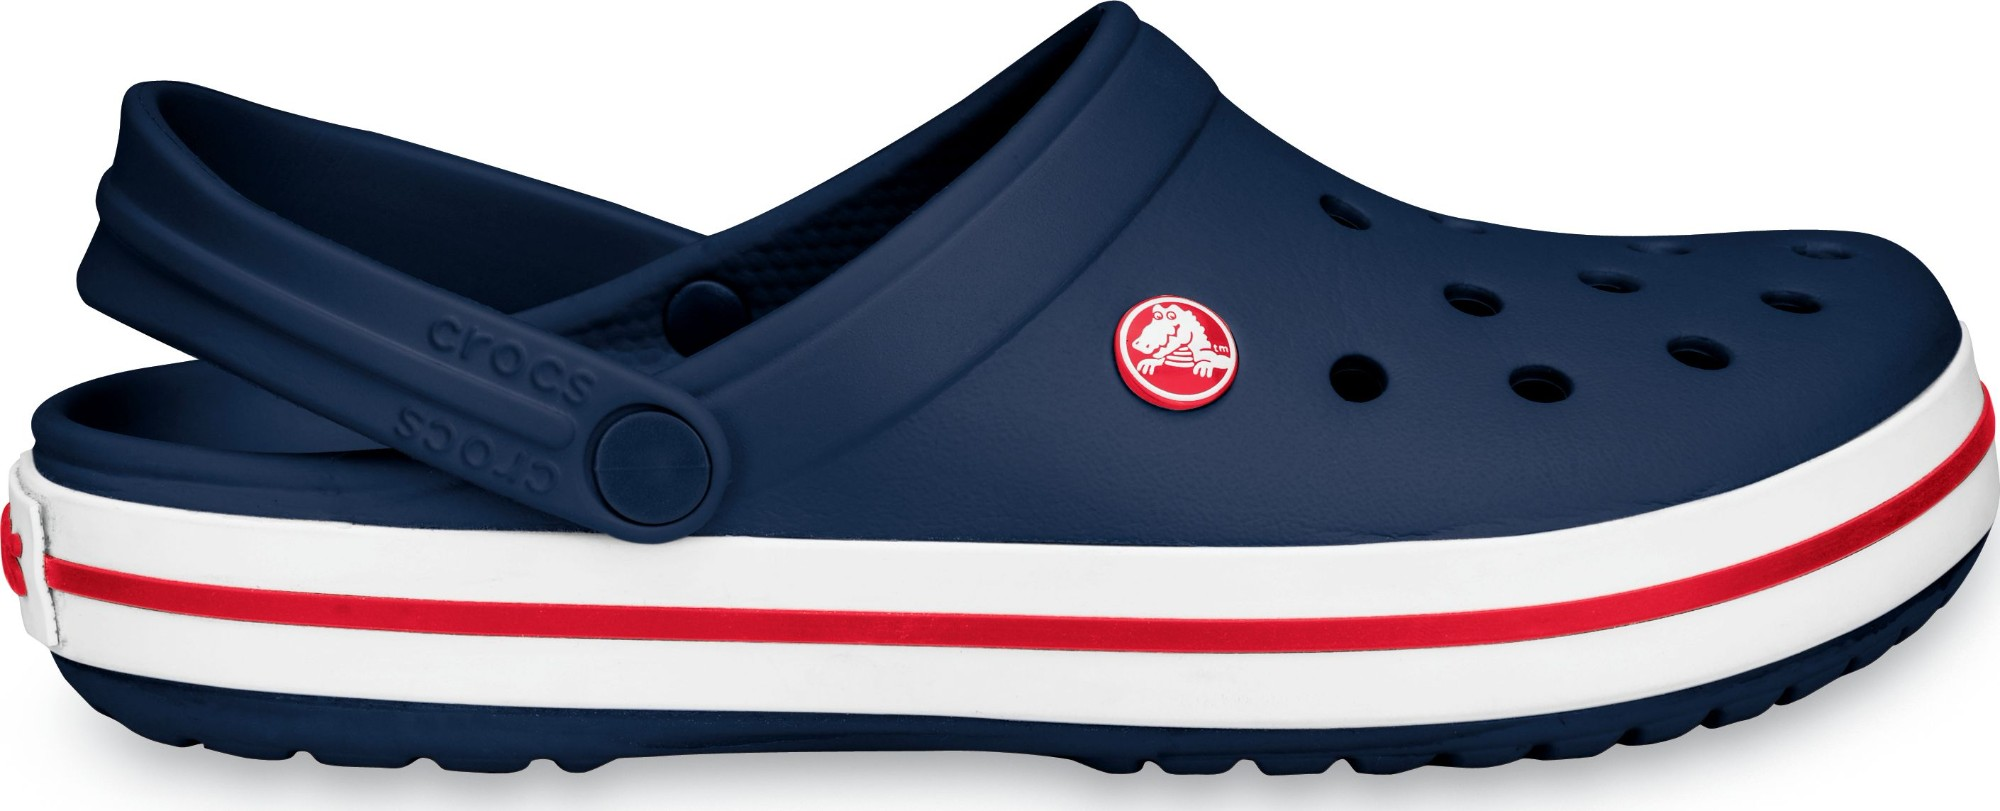 Crocs™ Crocband™ Navy 37,5